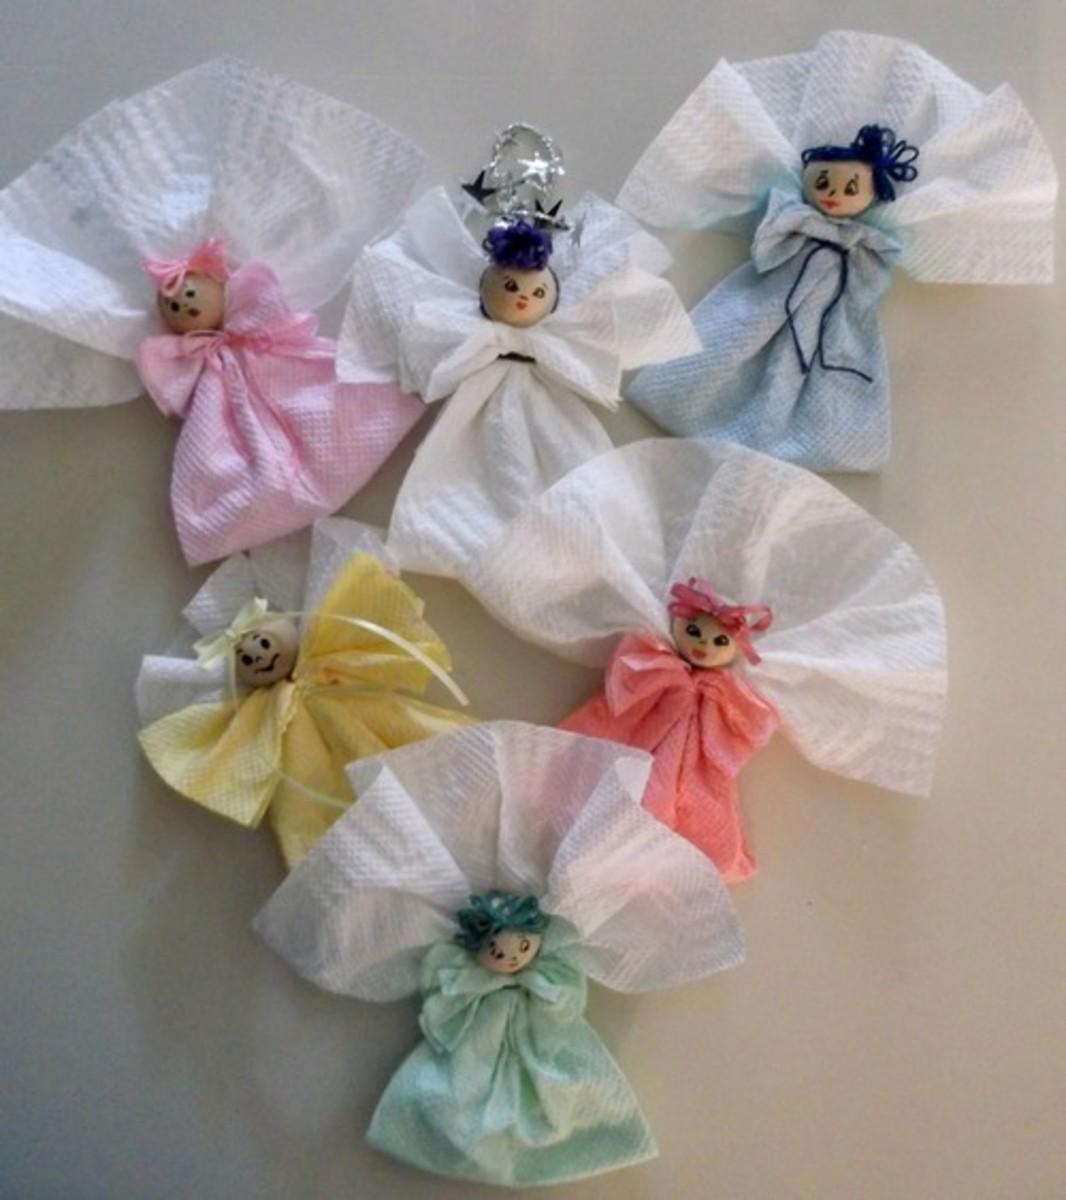 make-doll-ornaments-using-paper-towels